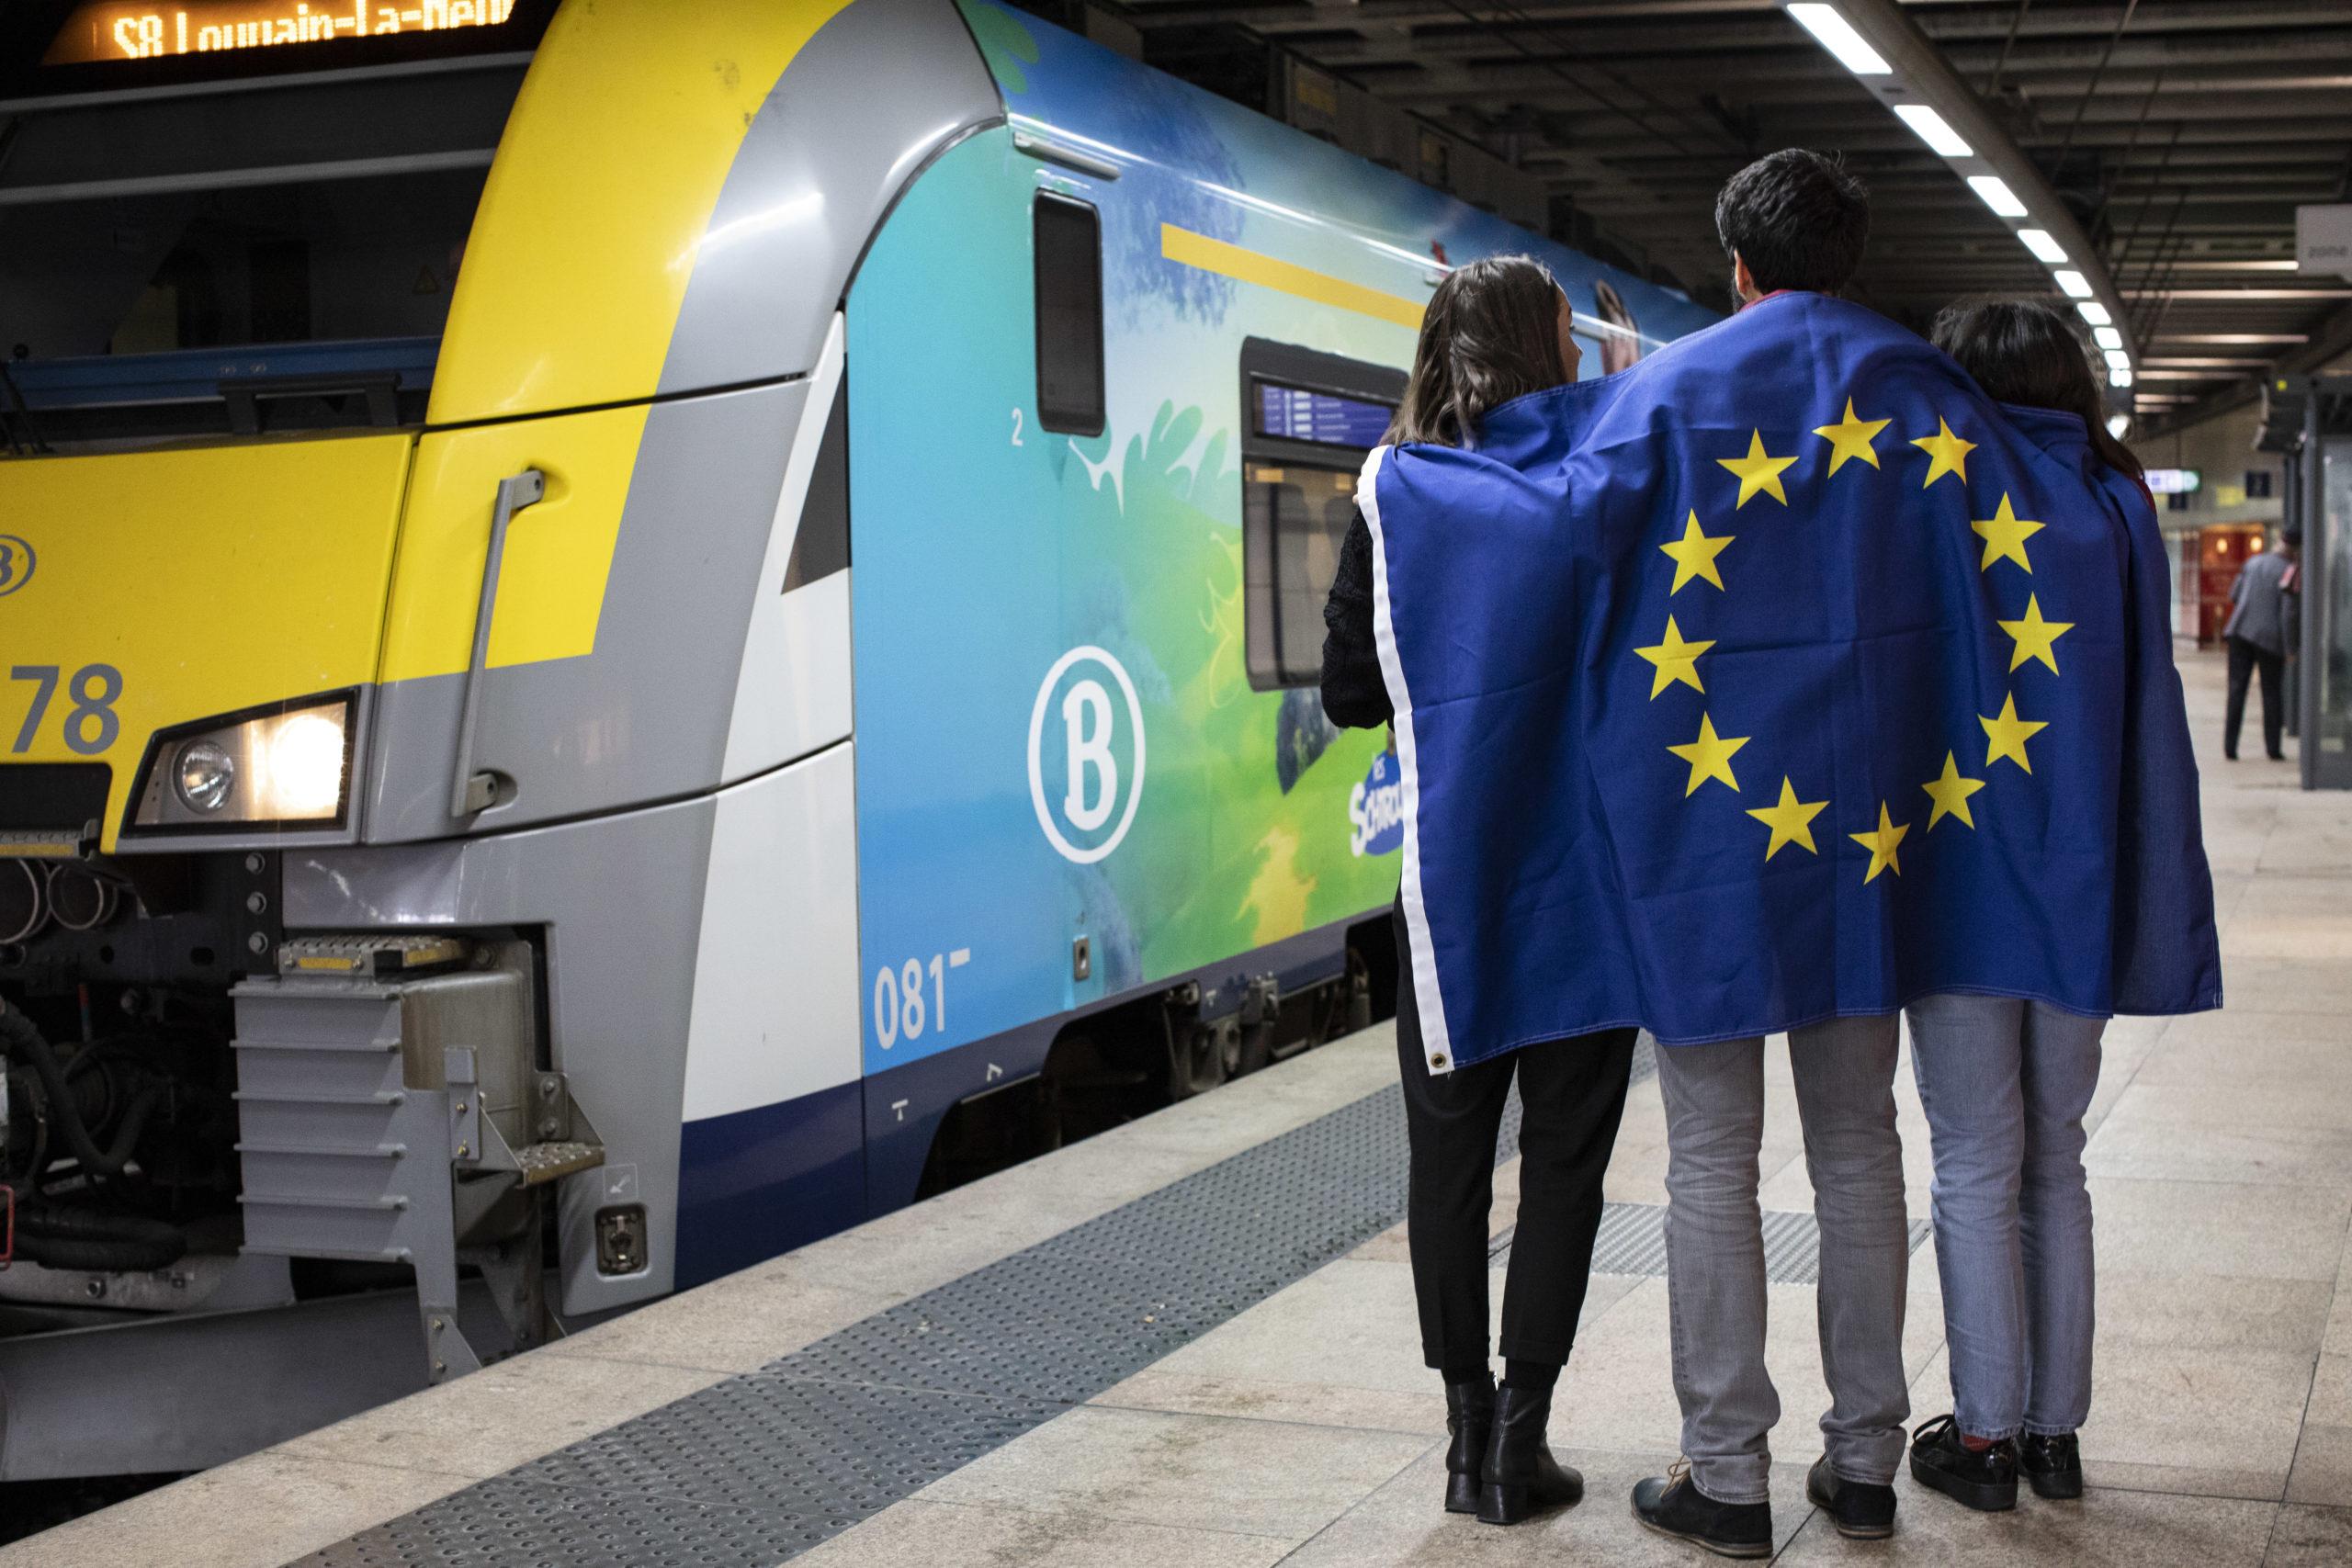 Brussels Schuman Station